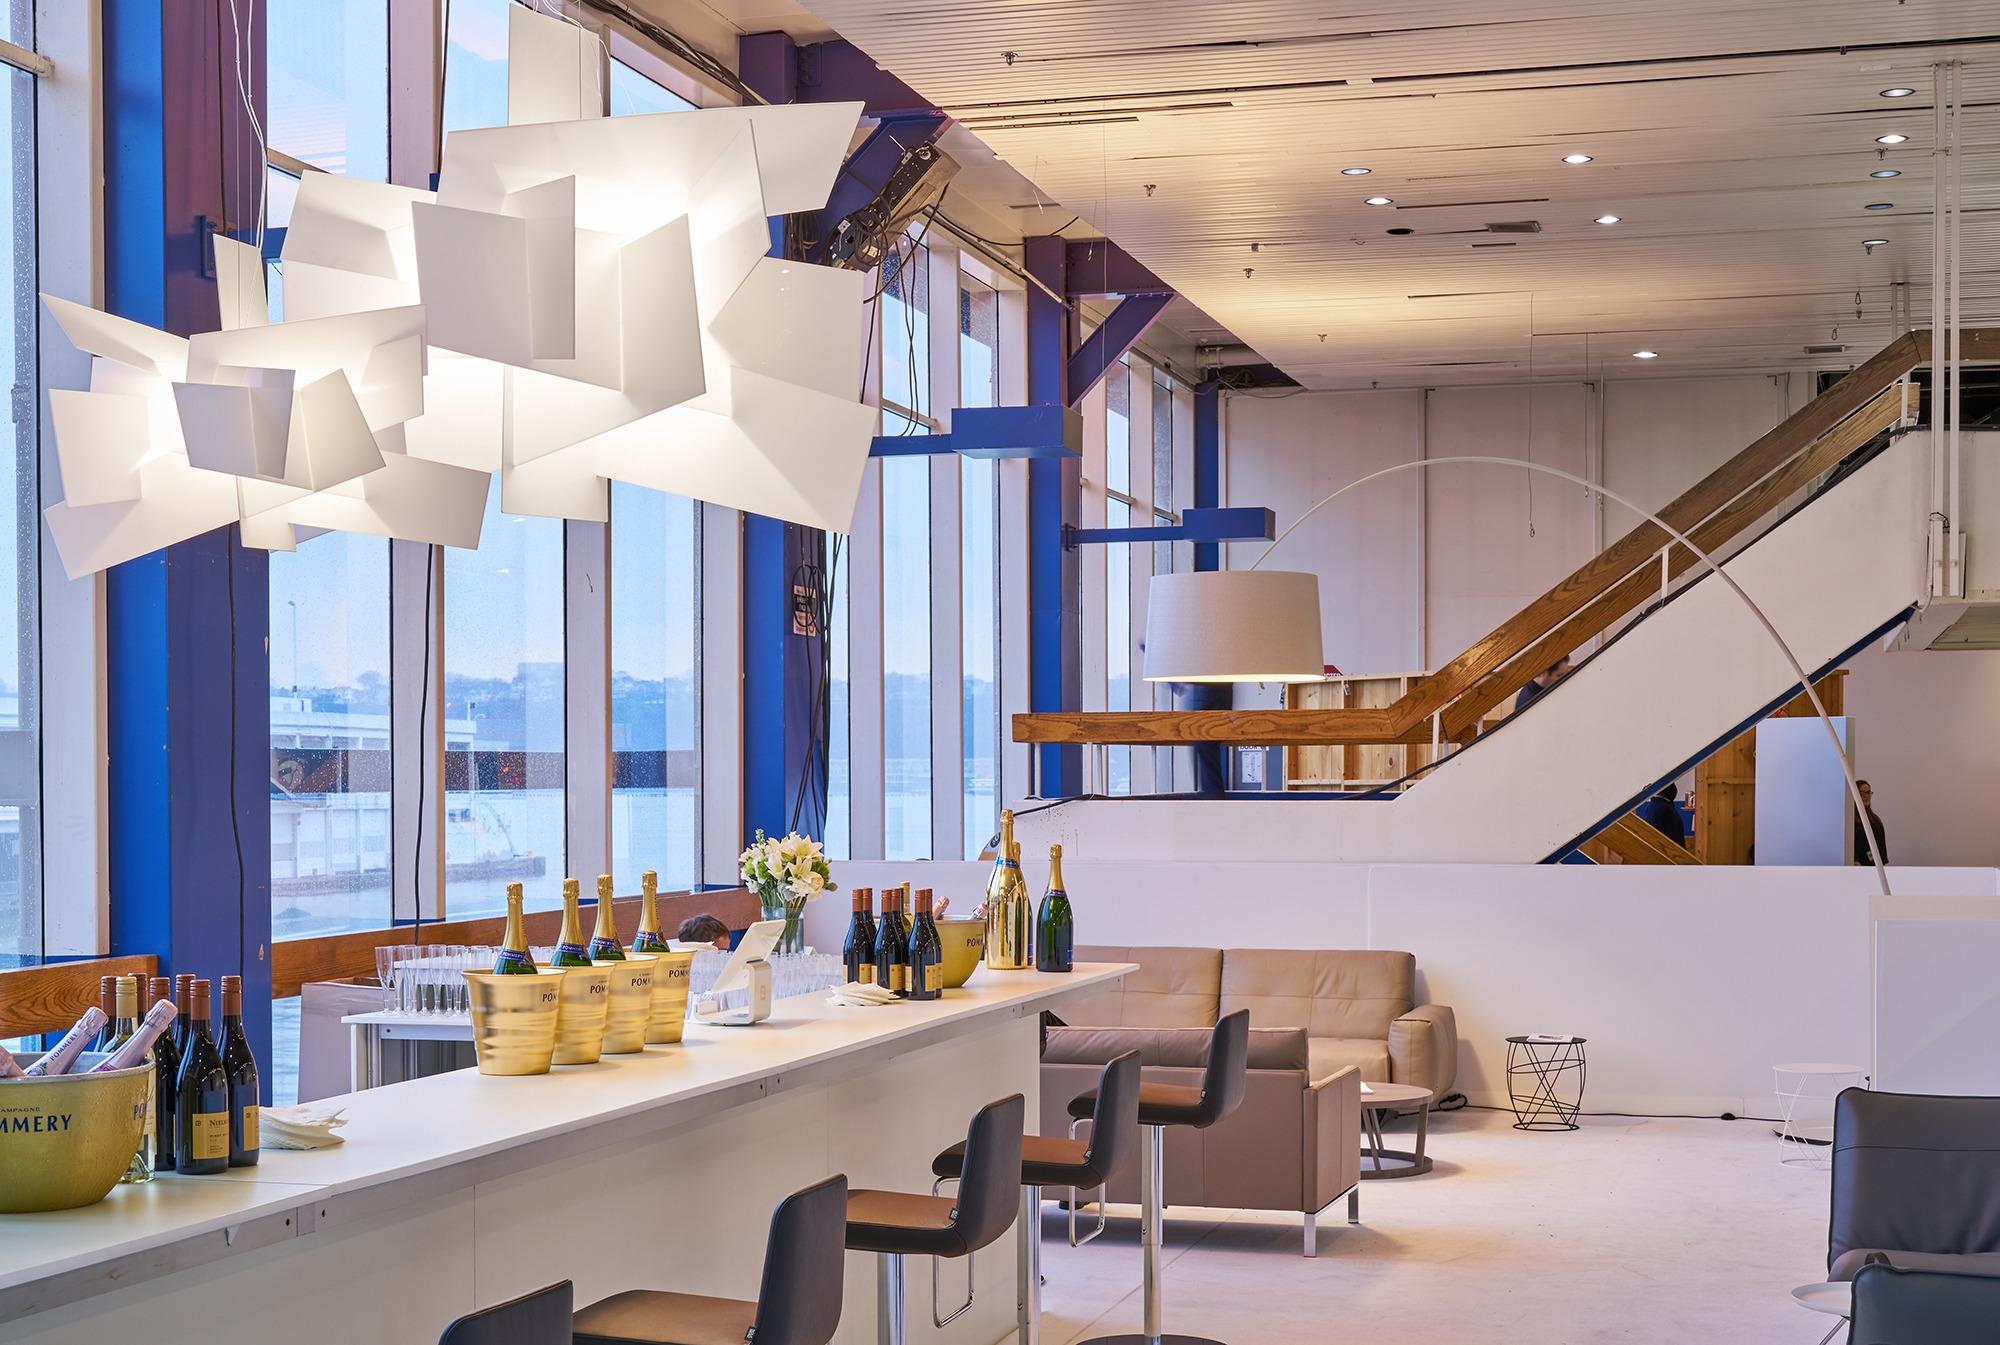 foscarini illuminates the armory show s vip lounges. Black Bedroom Furniture Sets. Home Design Ideas